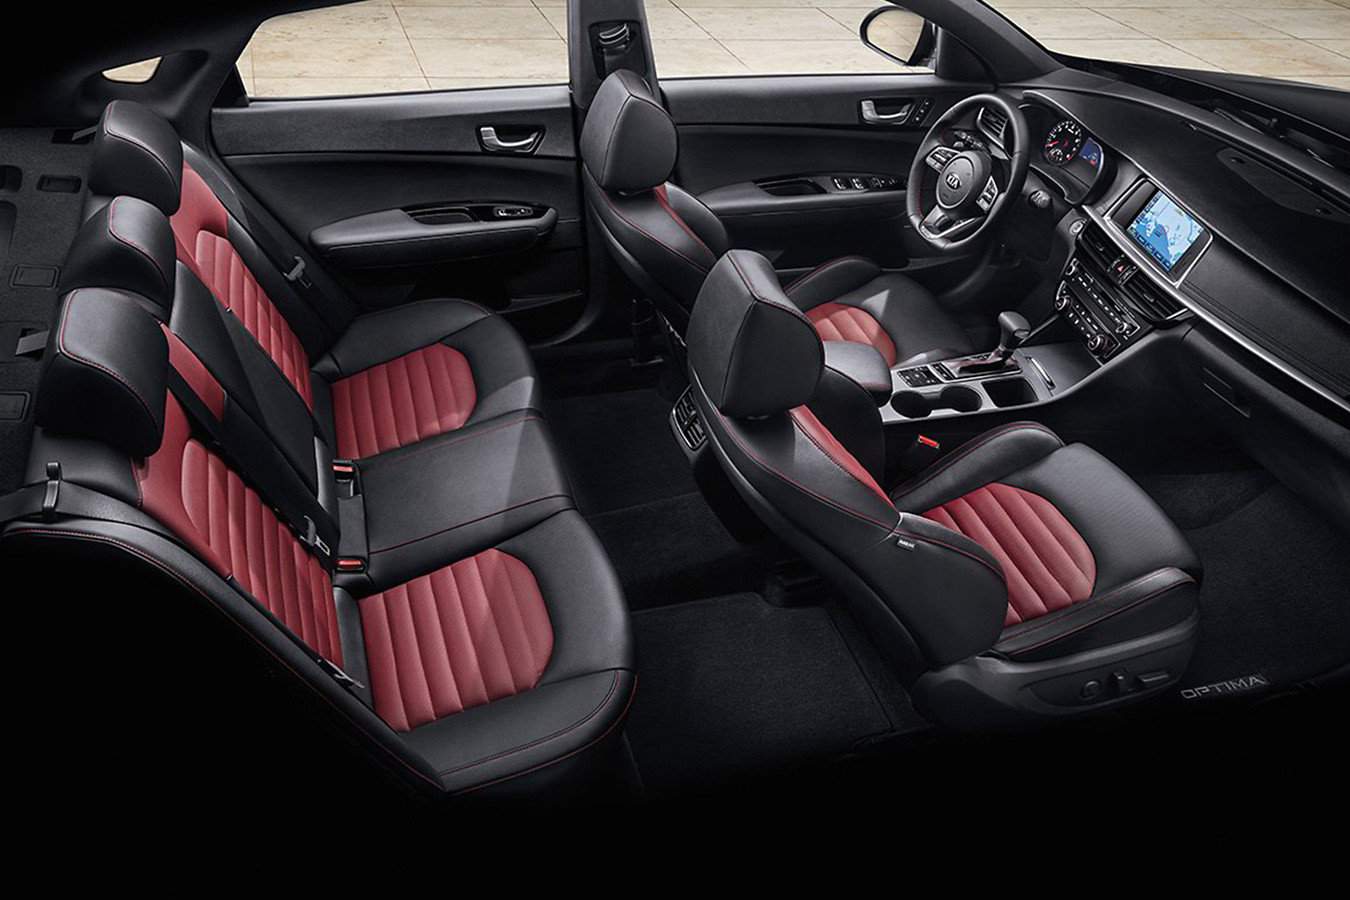 Step Inside the 2020 Kia Optima